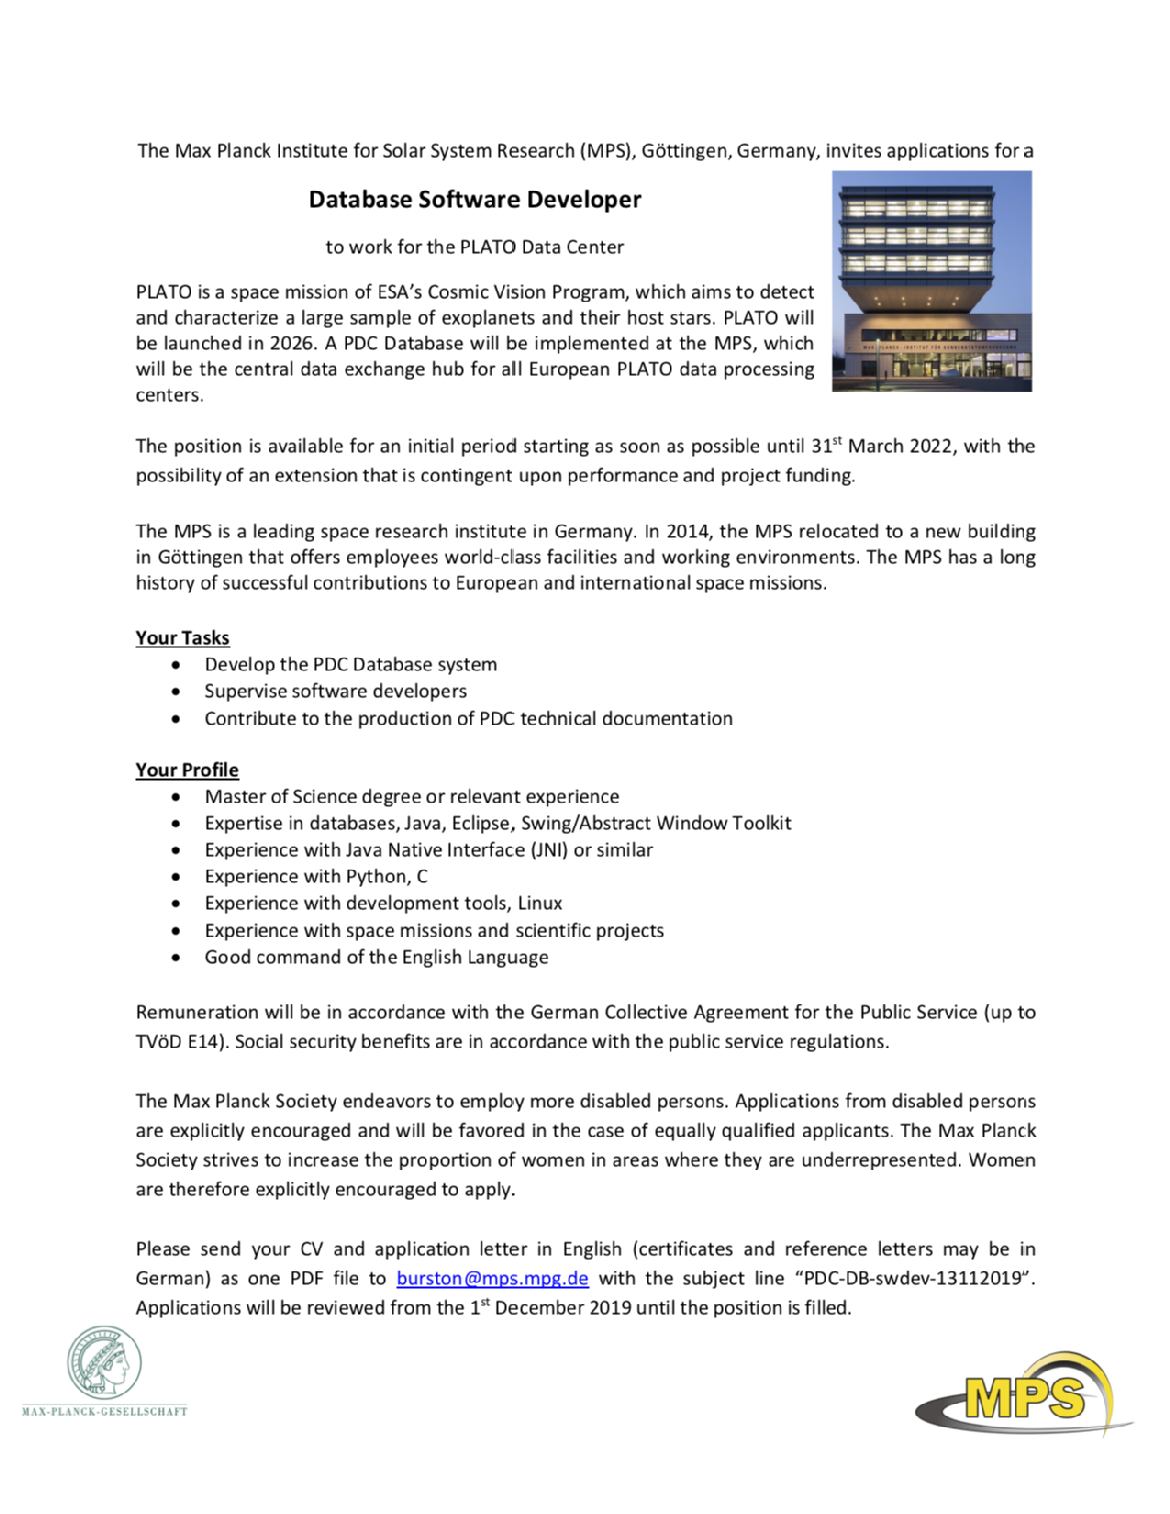 Detailed job advert of PDC Database Software Developer, higher-level position